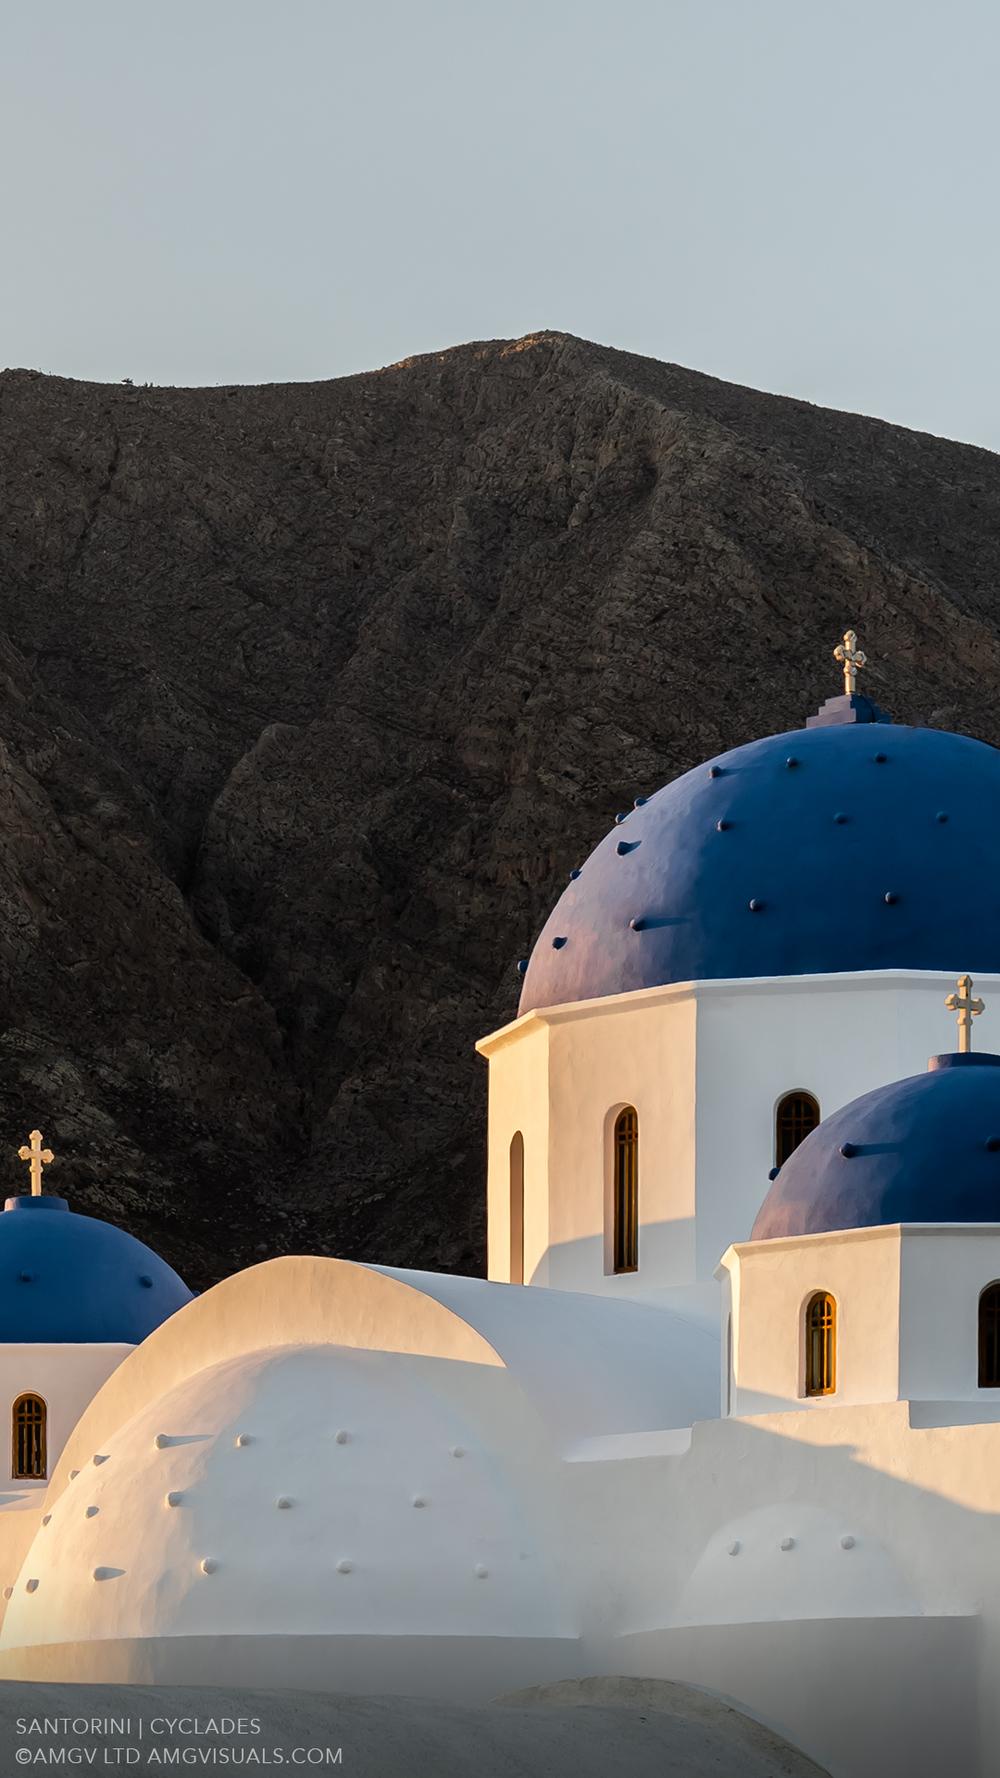 ©AMGV-LTD-Santorini+Cyclades-14.jpg